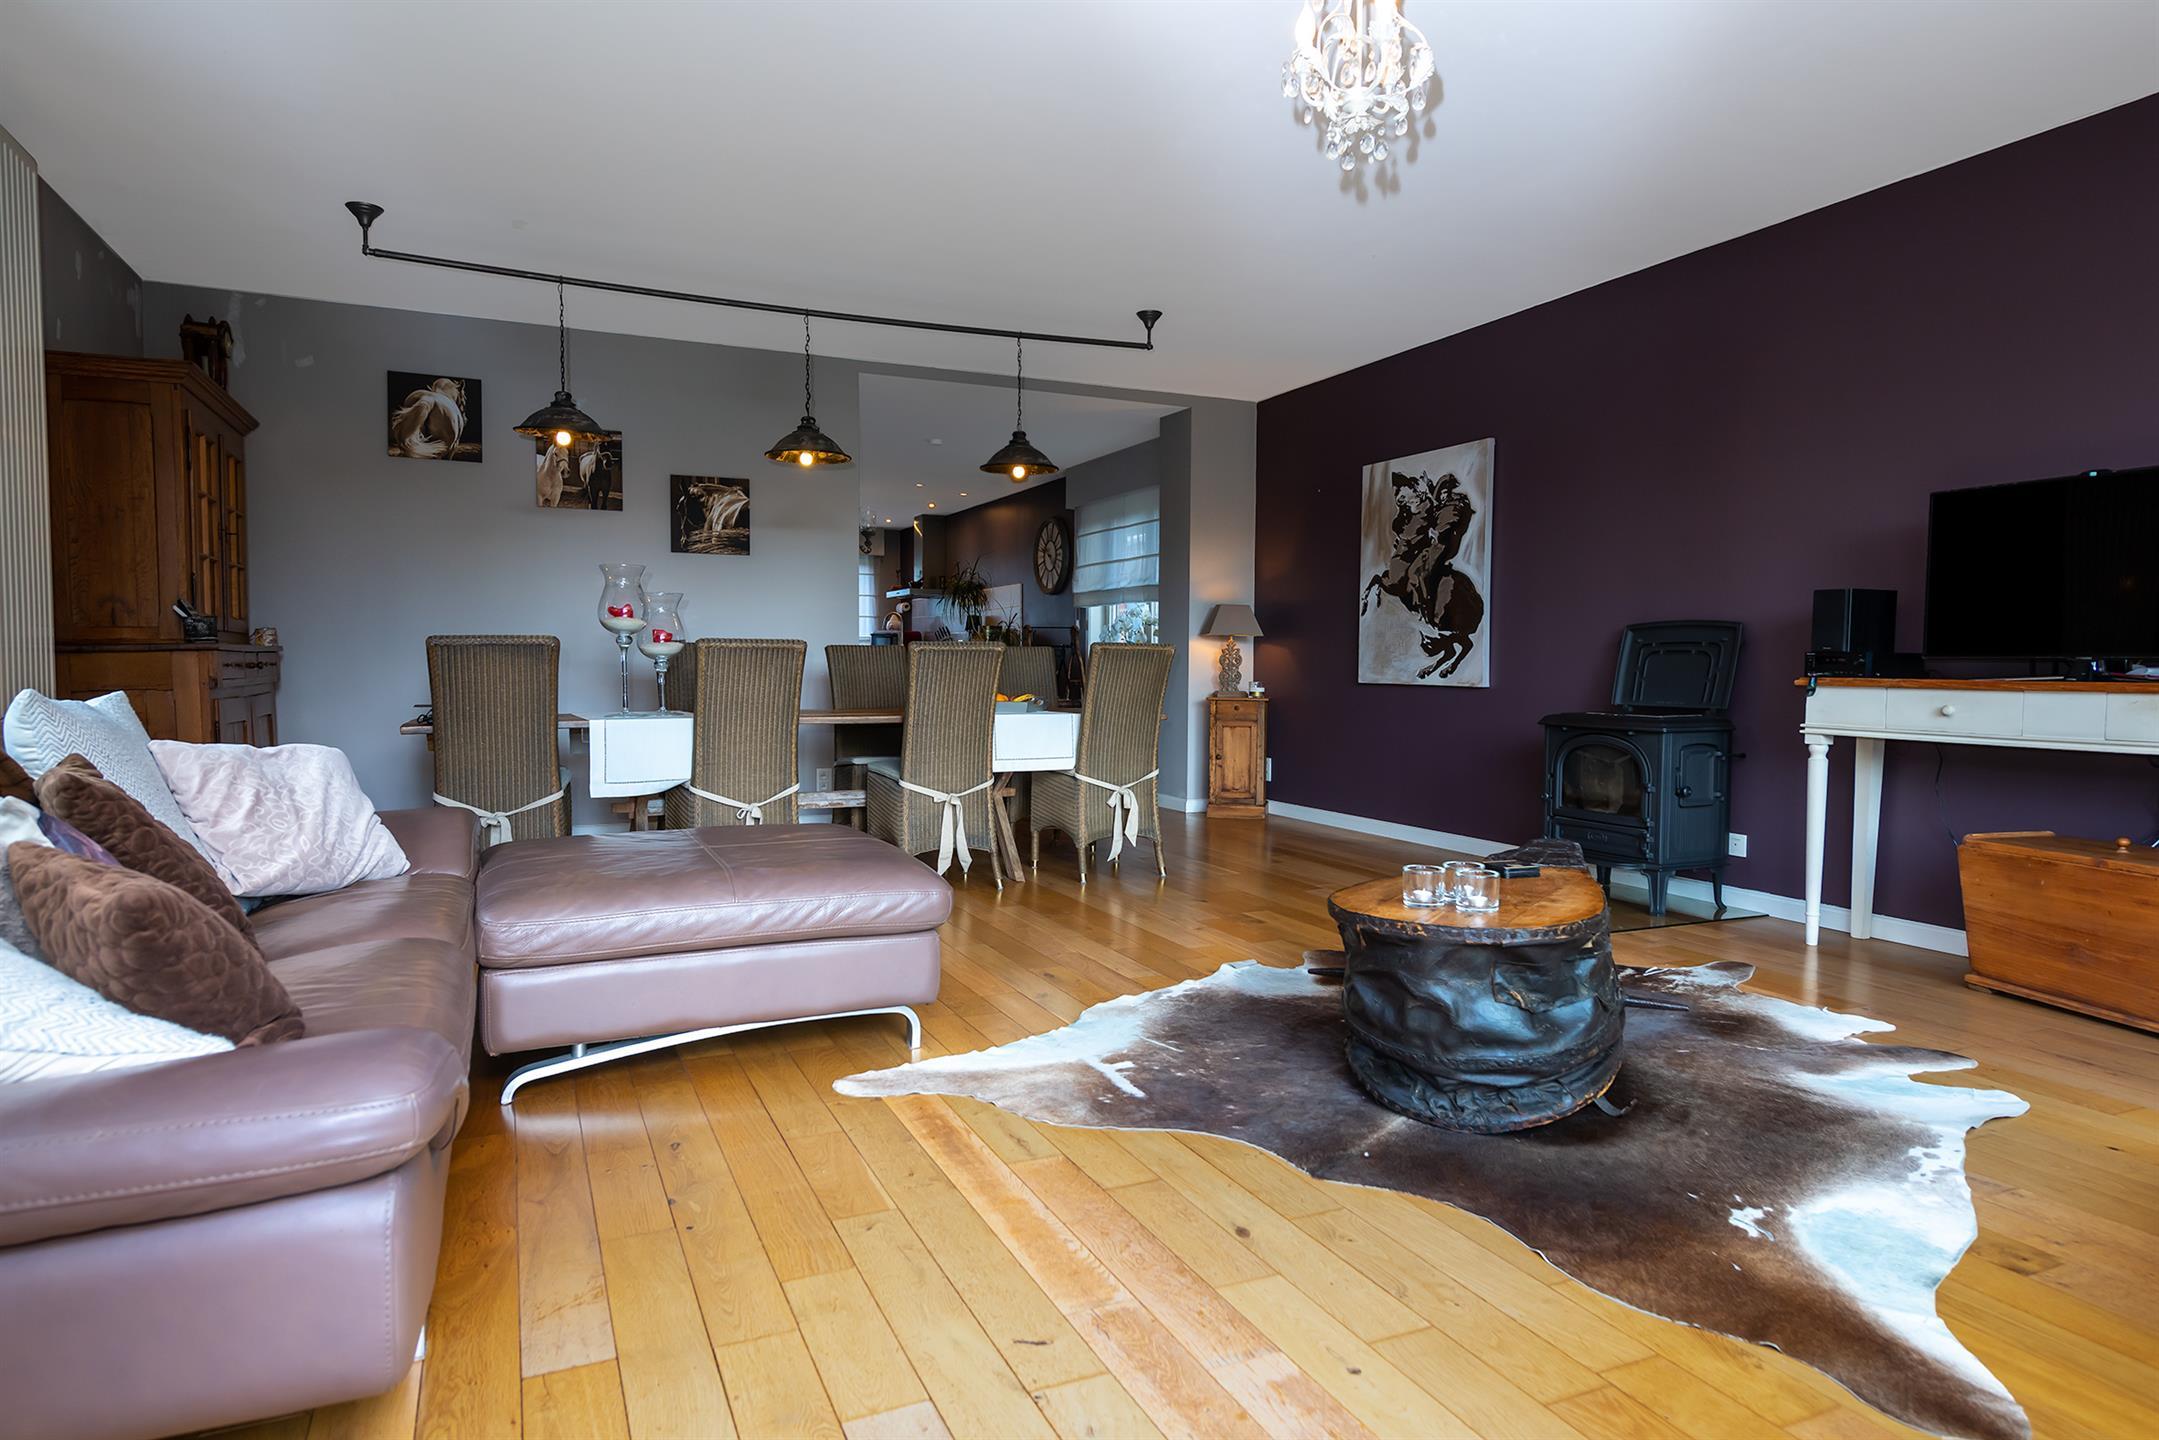 Charmant huis - Sint-Katelijne-Waver - #4492892-3